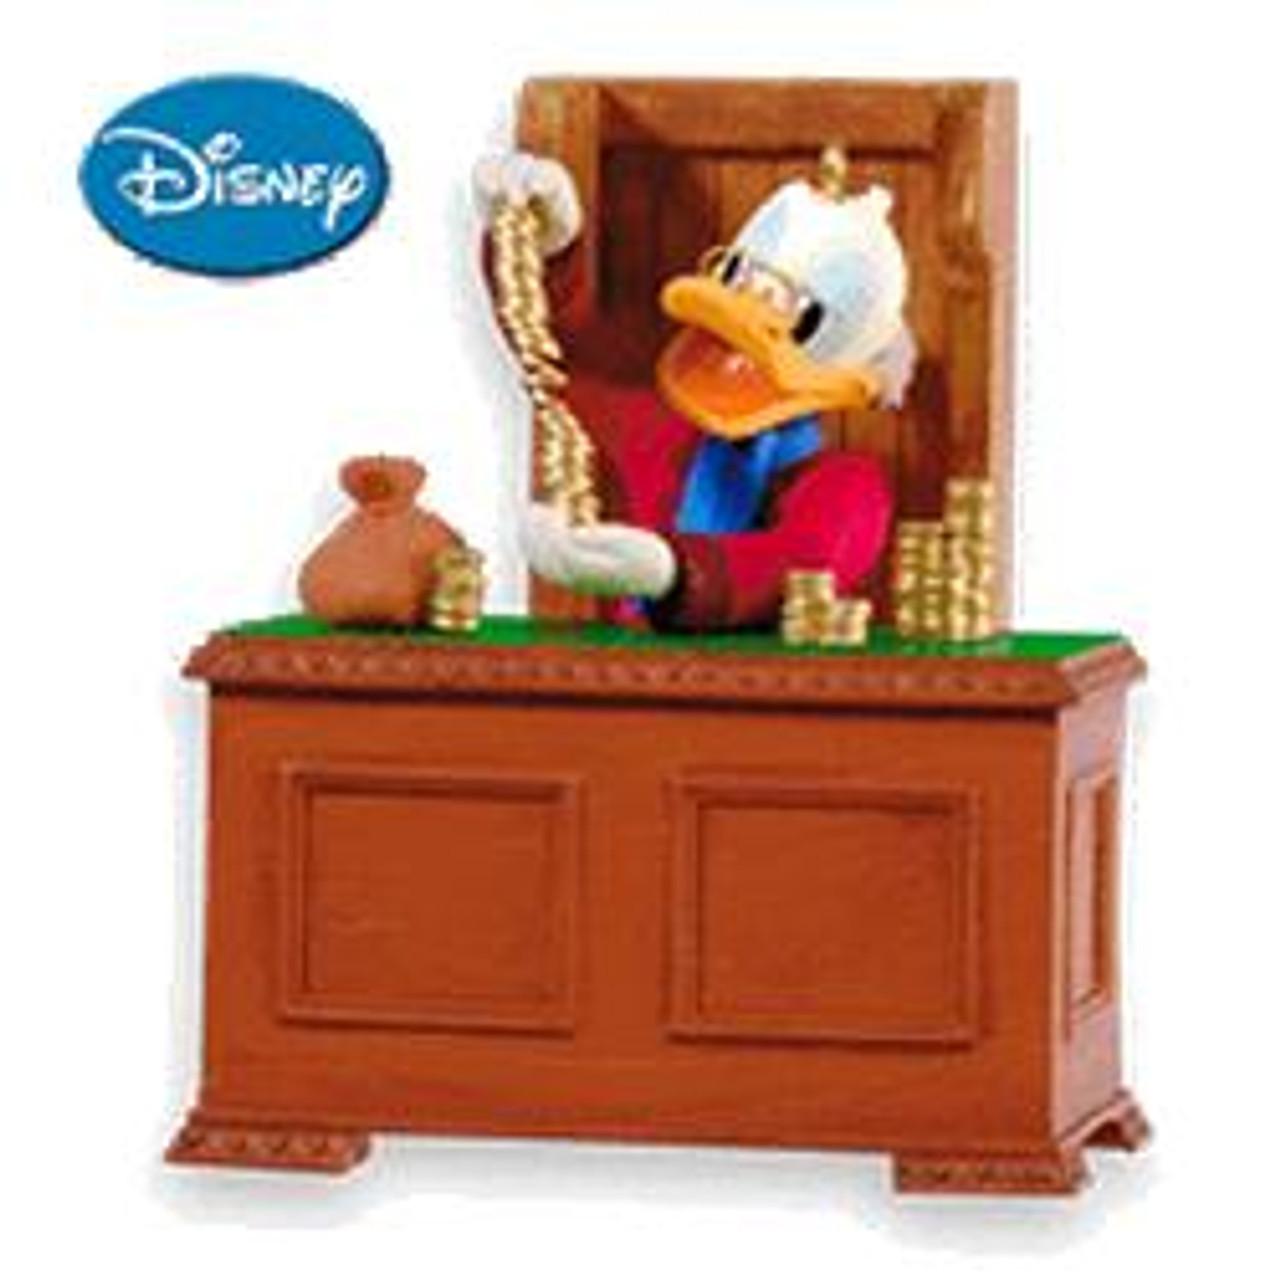 2010 Disney Christmas Carol 2 Scrooge Mcduck Hallmark Ornament